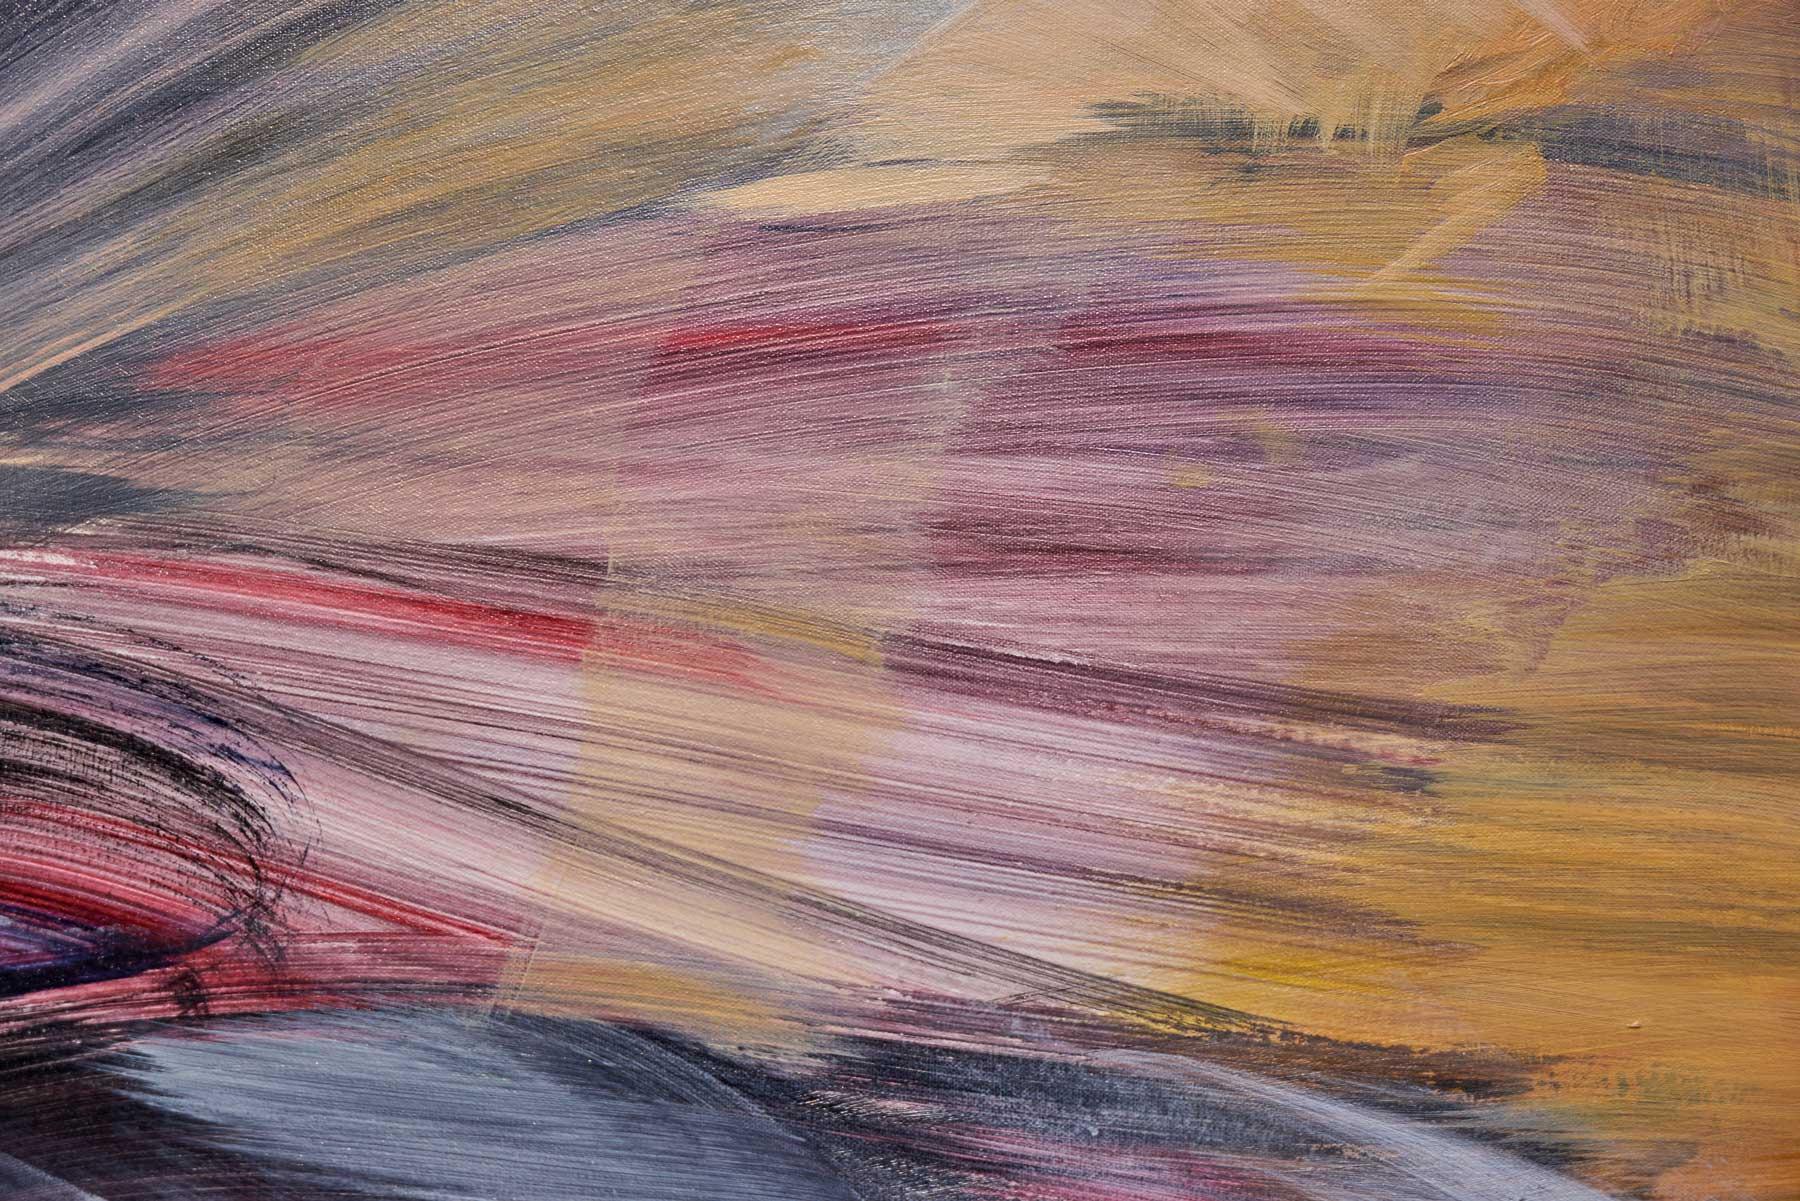 "Melanie Authier ,  Chimera , 2016, Acrylic on canvas, 72"" x 108"" (182,9 x 274,3 cm) (Detail)"